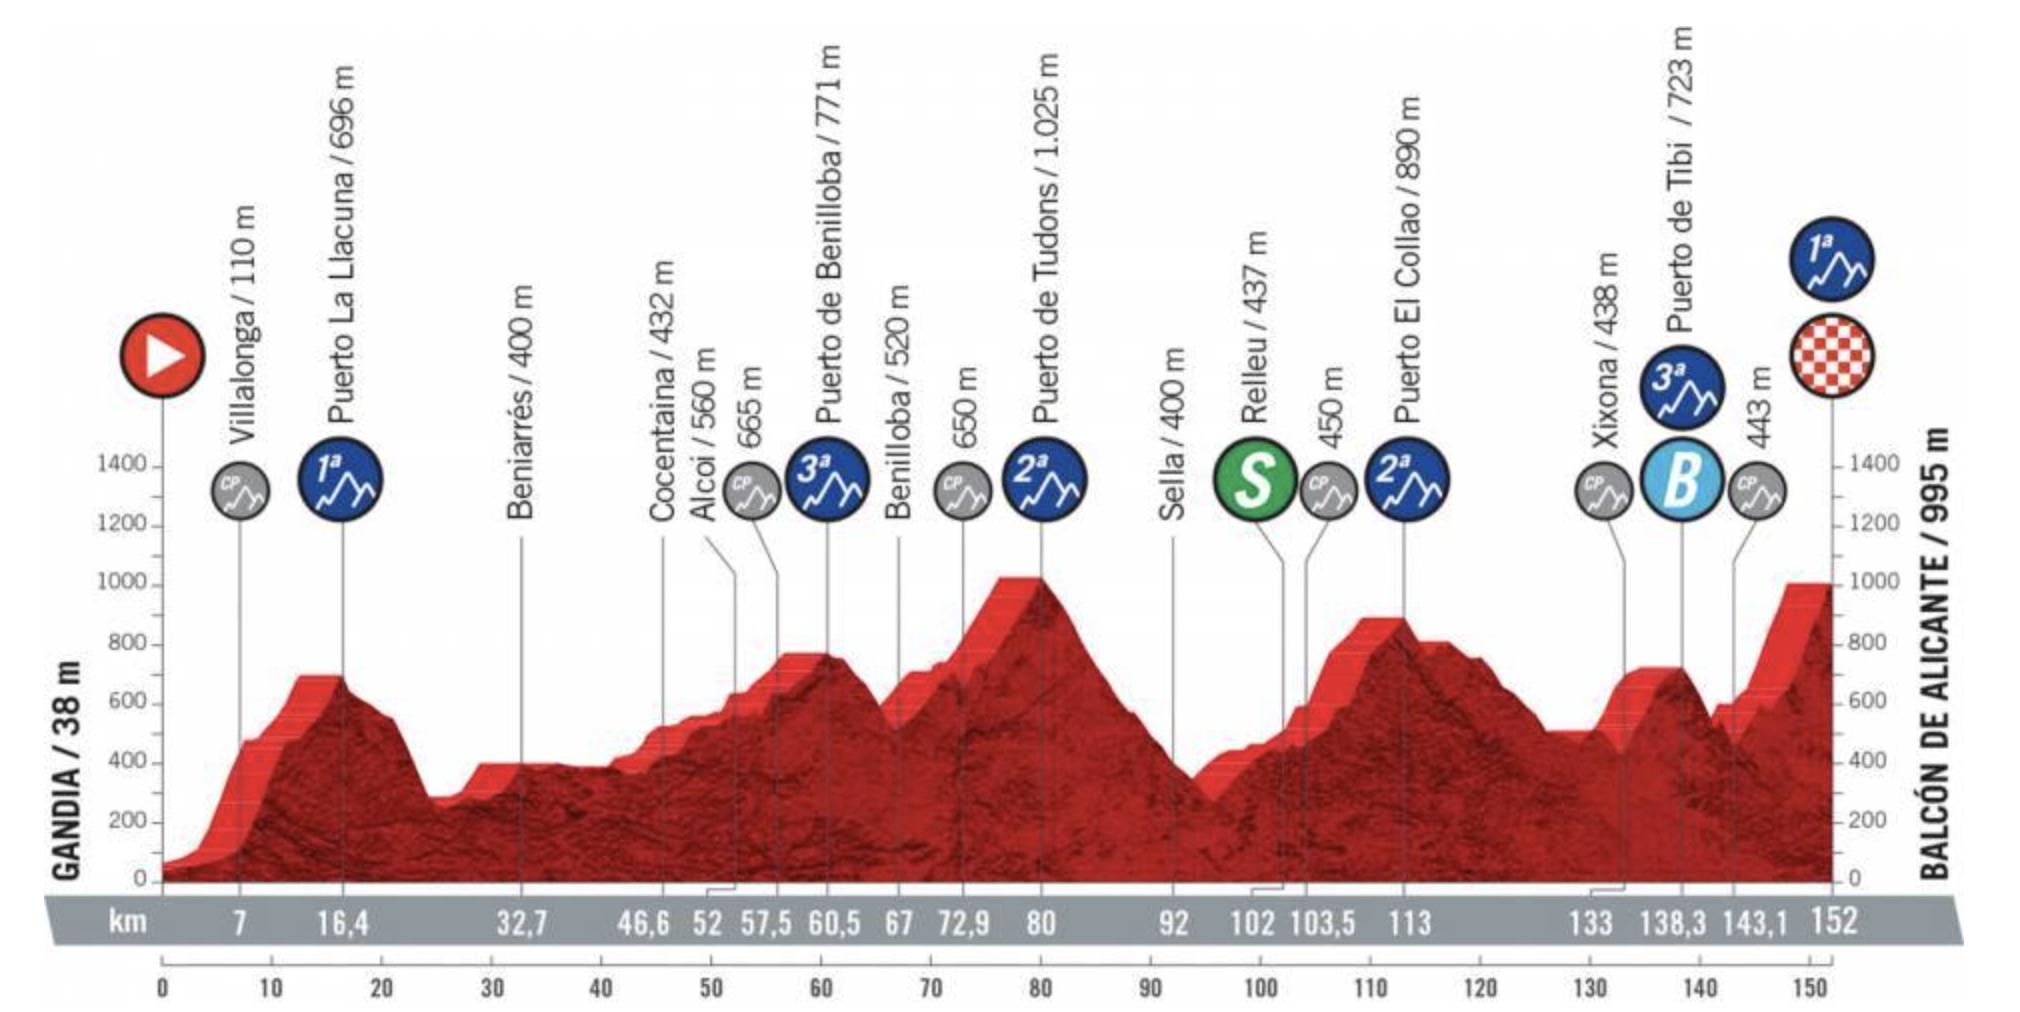 Vuelta a Espana 2021 - Stage 7